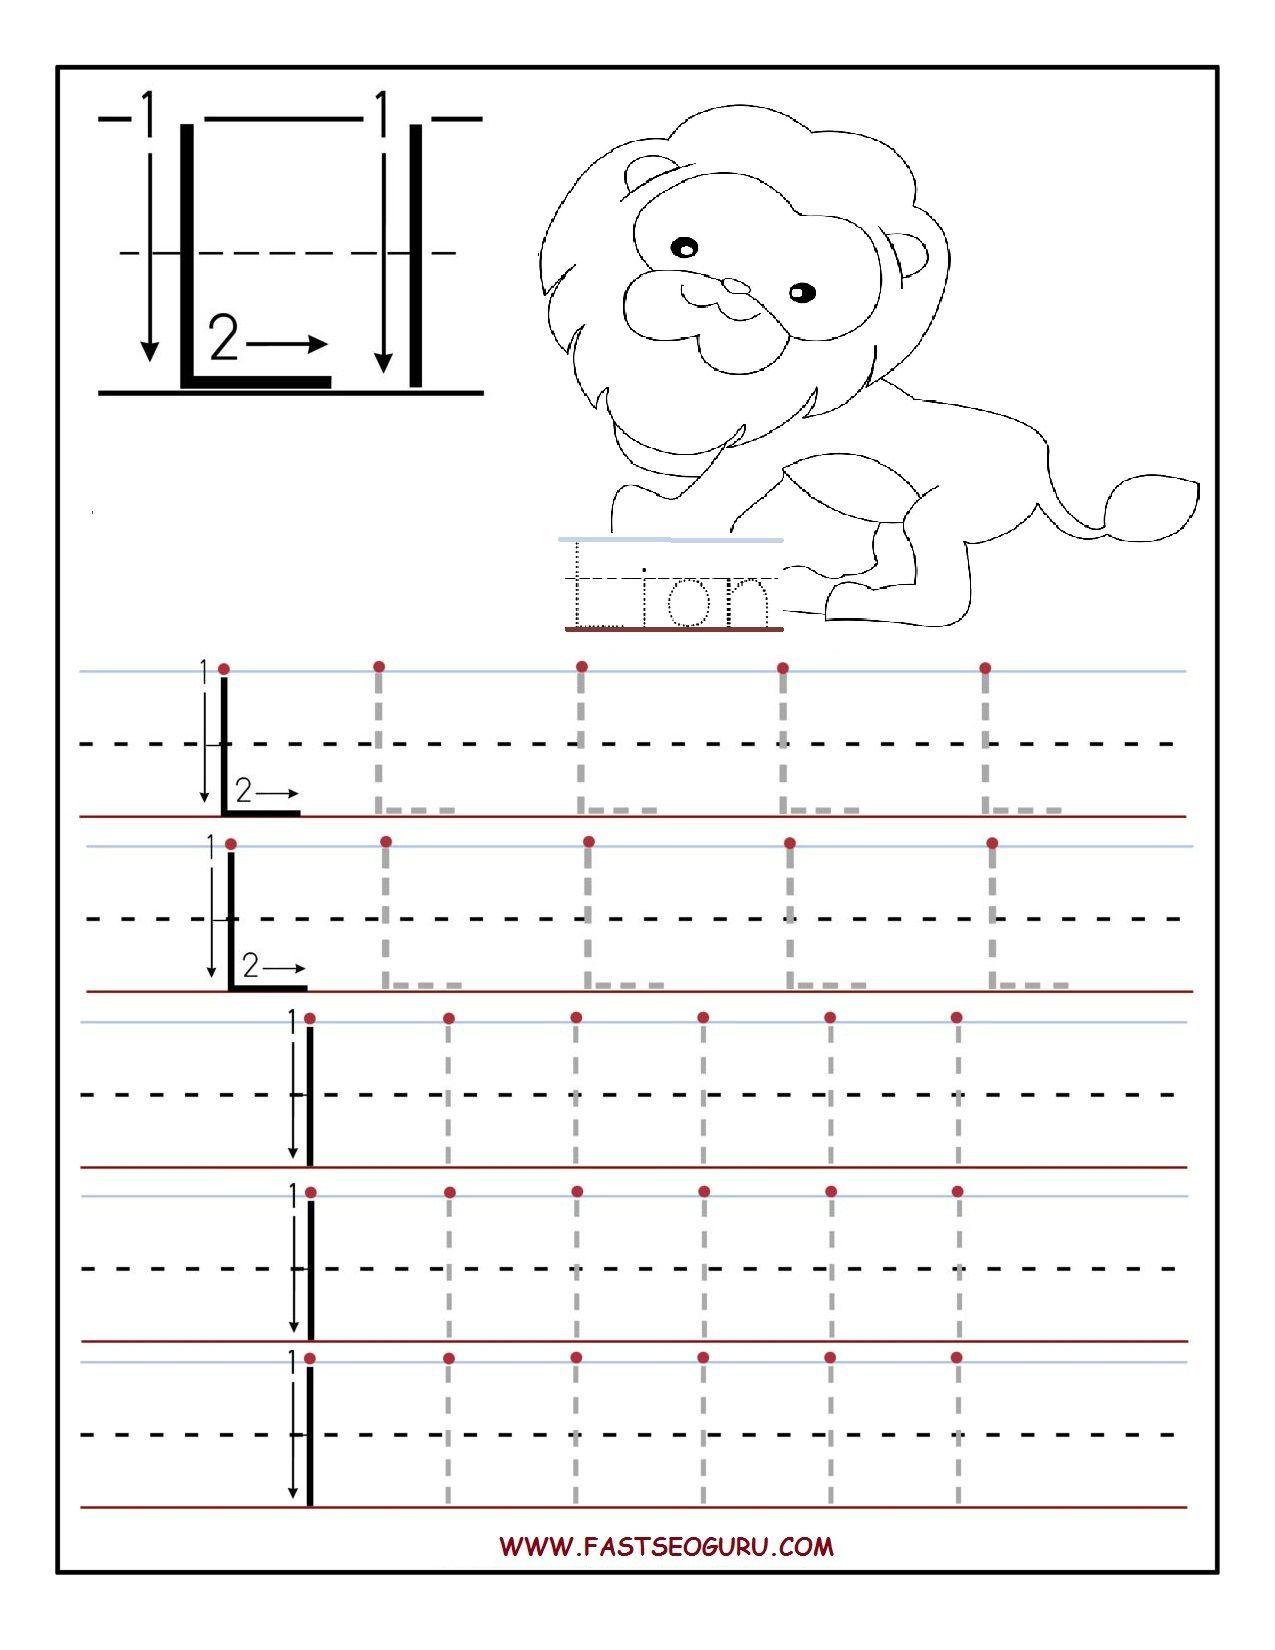 Printable Letter L Tracing Worksheets For Preschool Preschool Letters Letter L Worksheets Letter Worksheets For Preschool [ 1650 x 1275 Pixel ]